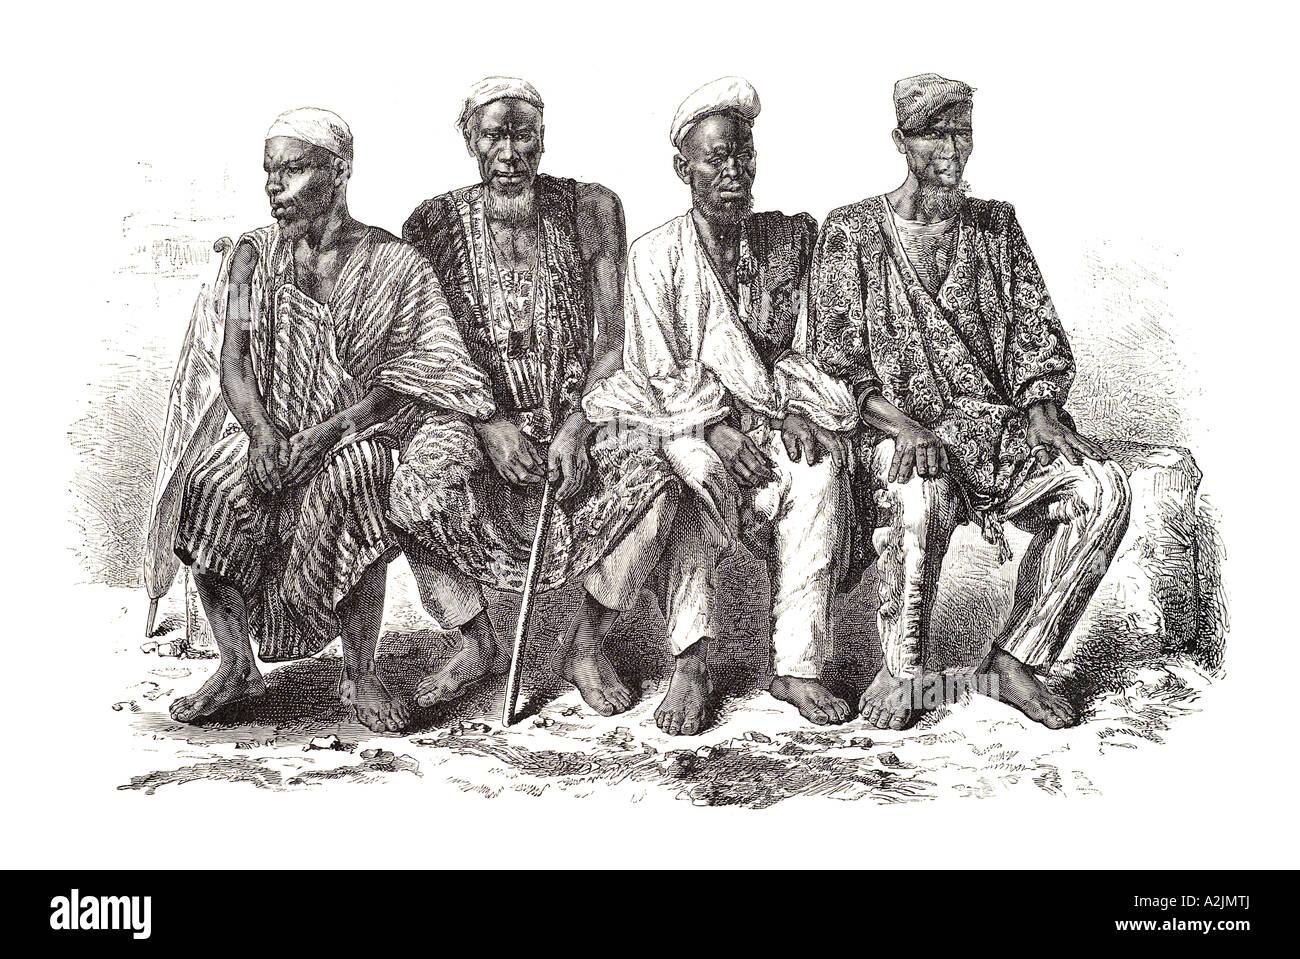 Africa African Man costume national dress traditional clothing men north east sat seated muslim islam pilgrim berber mali robe  sc 1 st  Alamy & Africa African Man costume national dress traditional clothing men ...